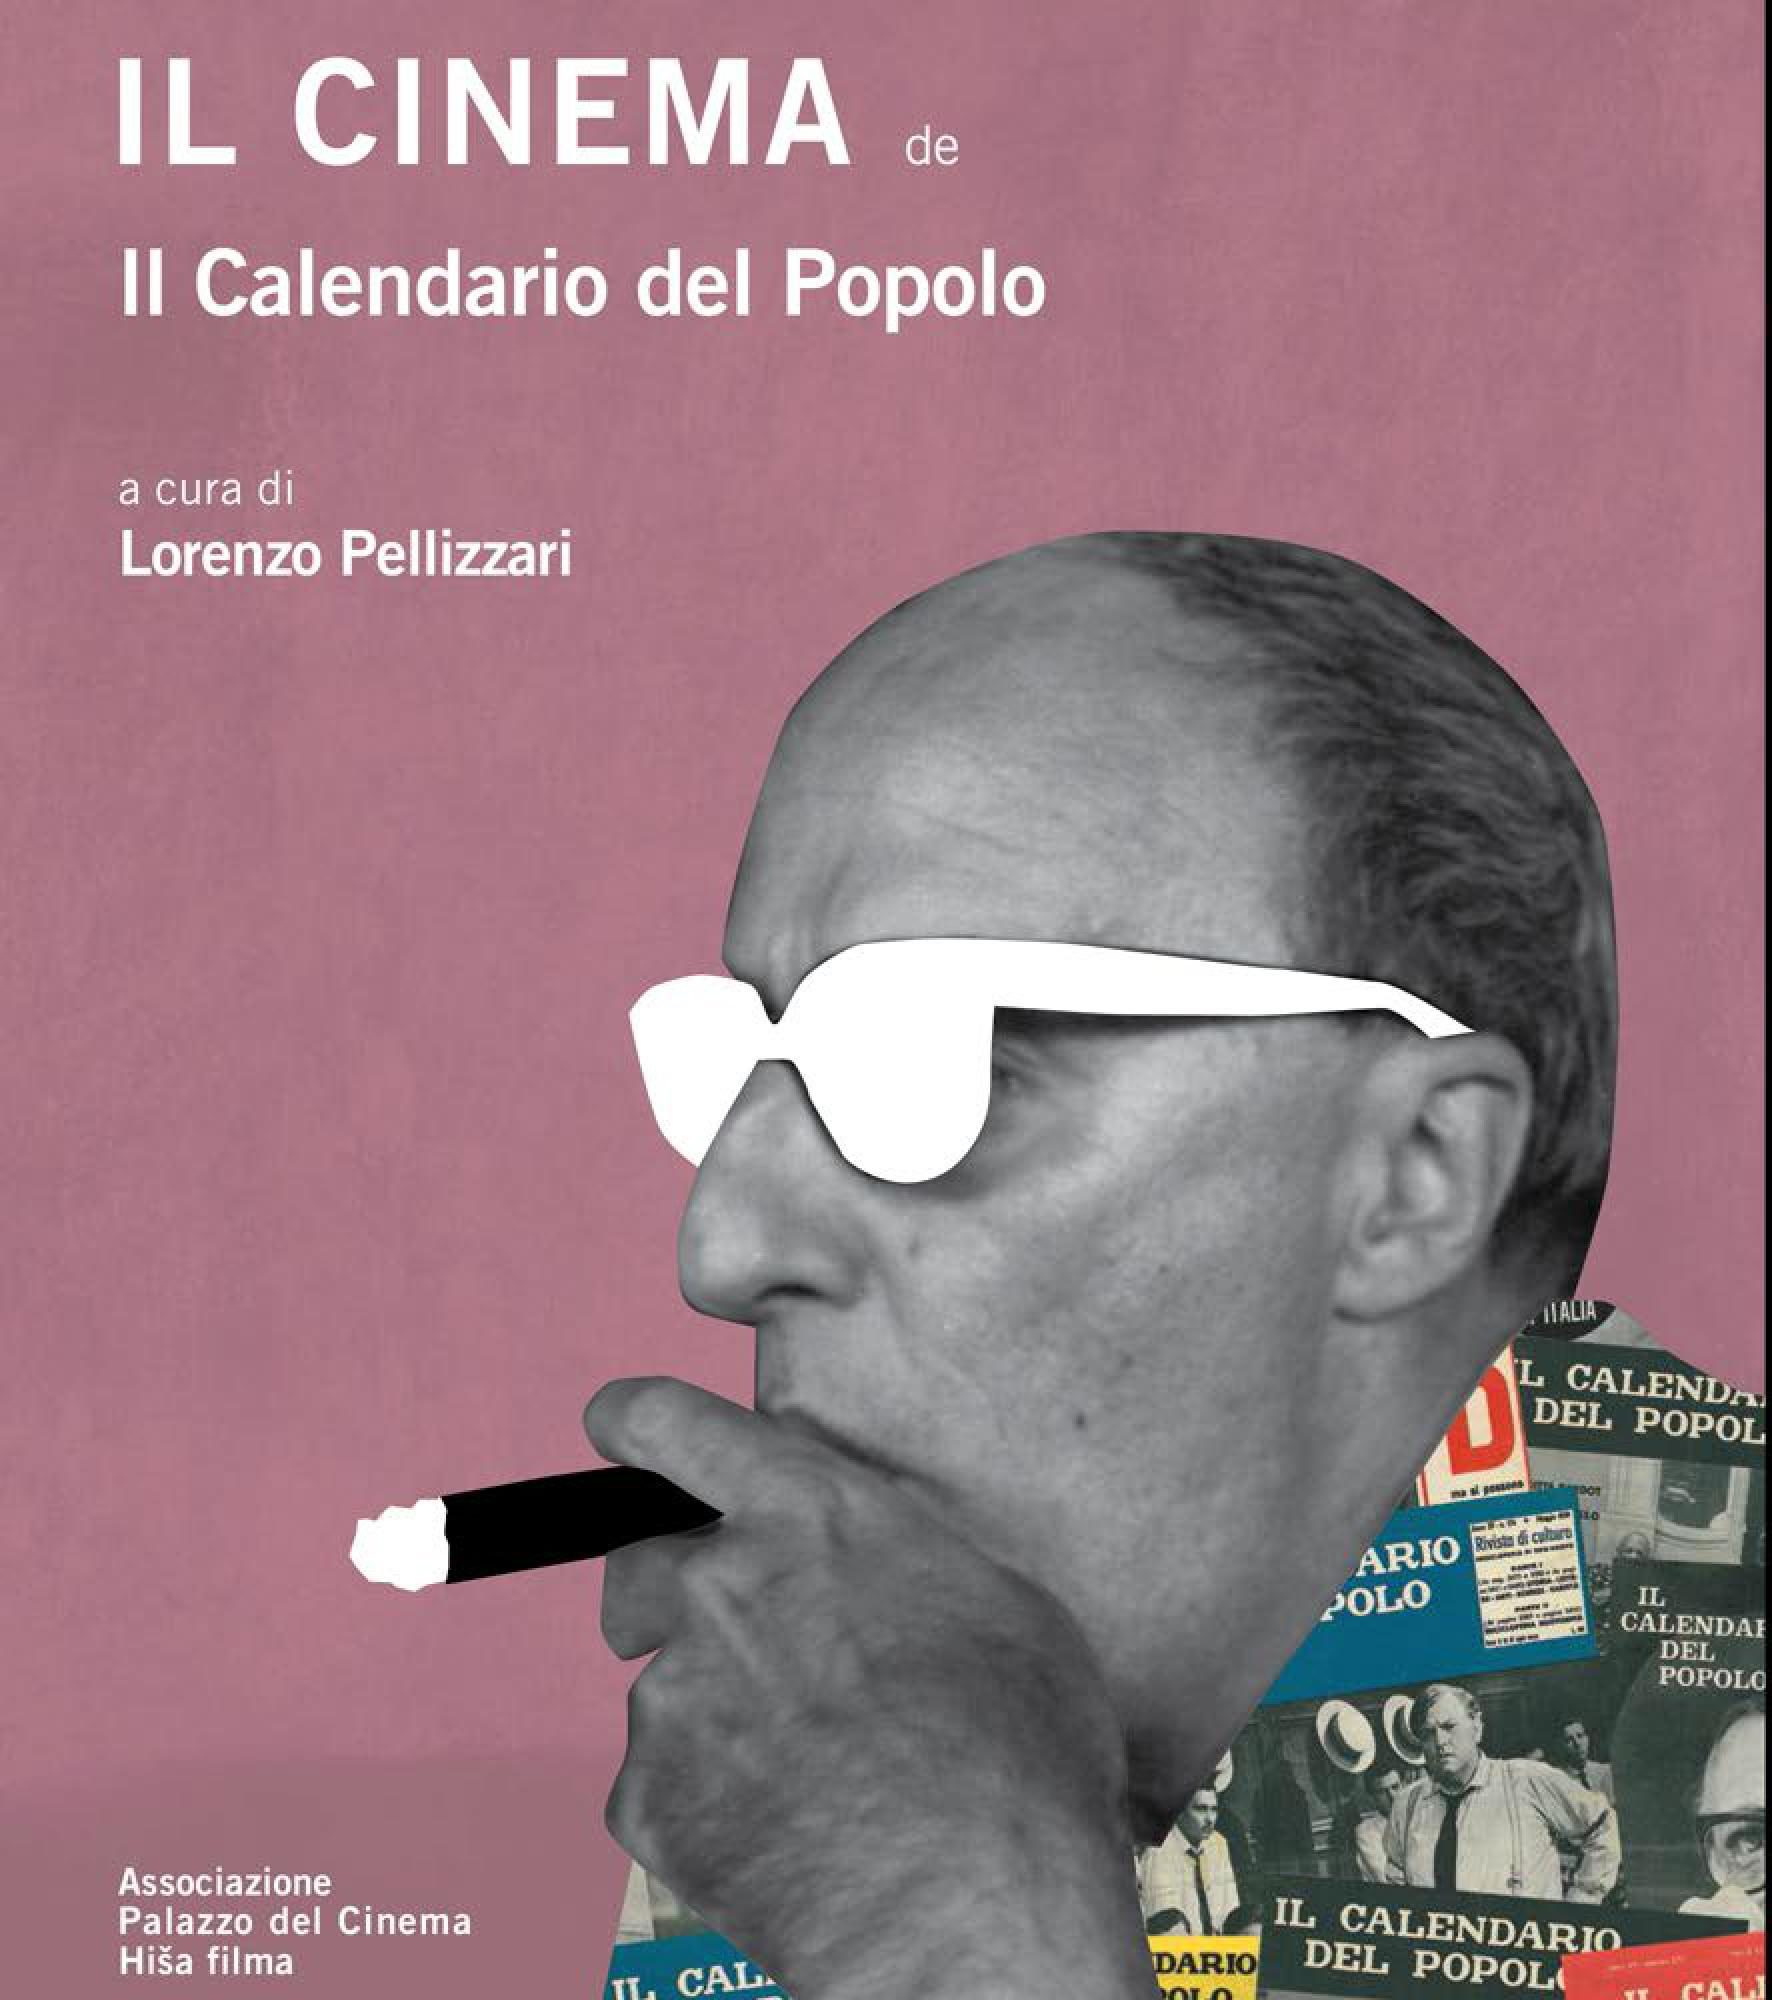 Уго Казираги – Кинематограф Журнала Calendario Del Popolo